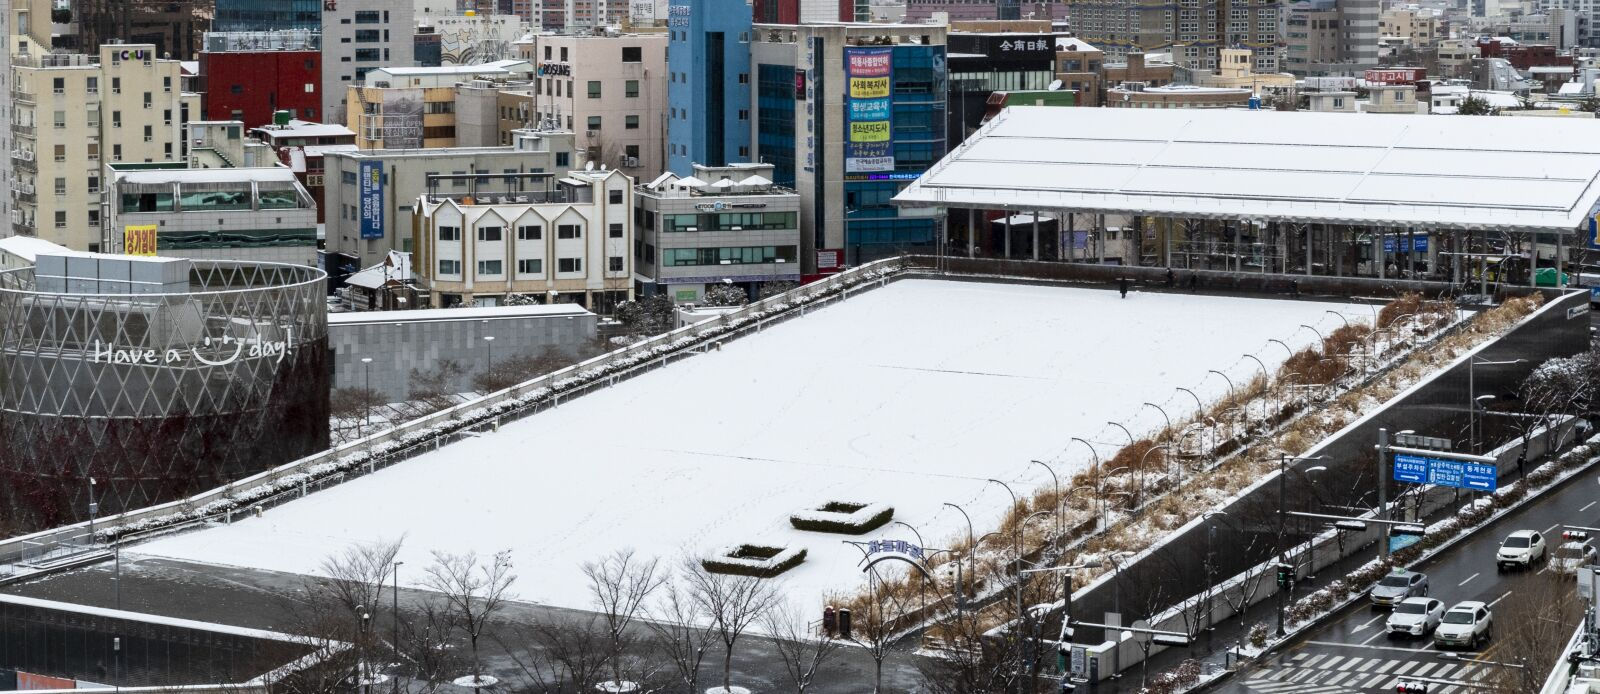 "Canon EOS-1D X Mark II sample photo. ""Snow, winter, day"" photography"